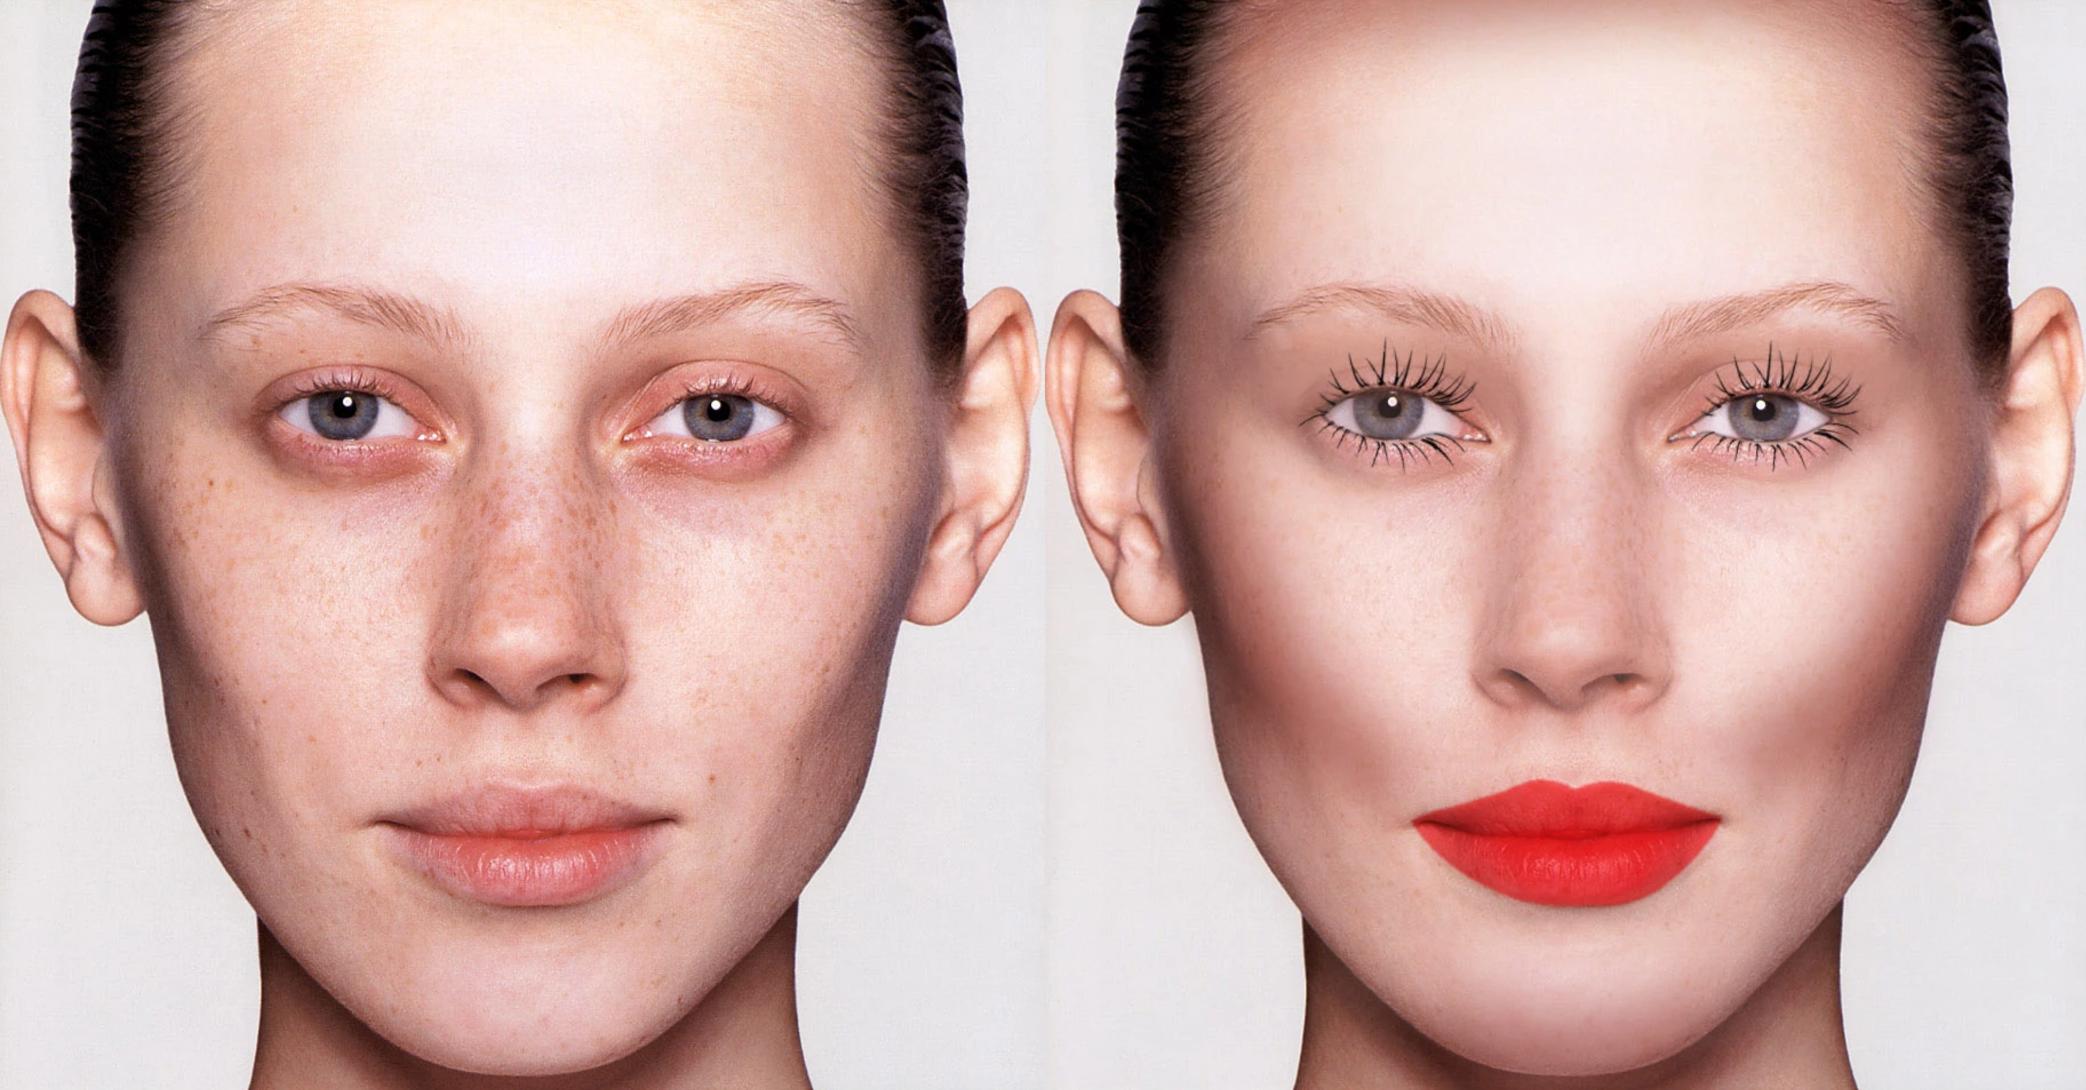 Photo Manipulation (Make Up)